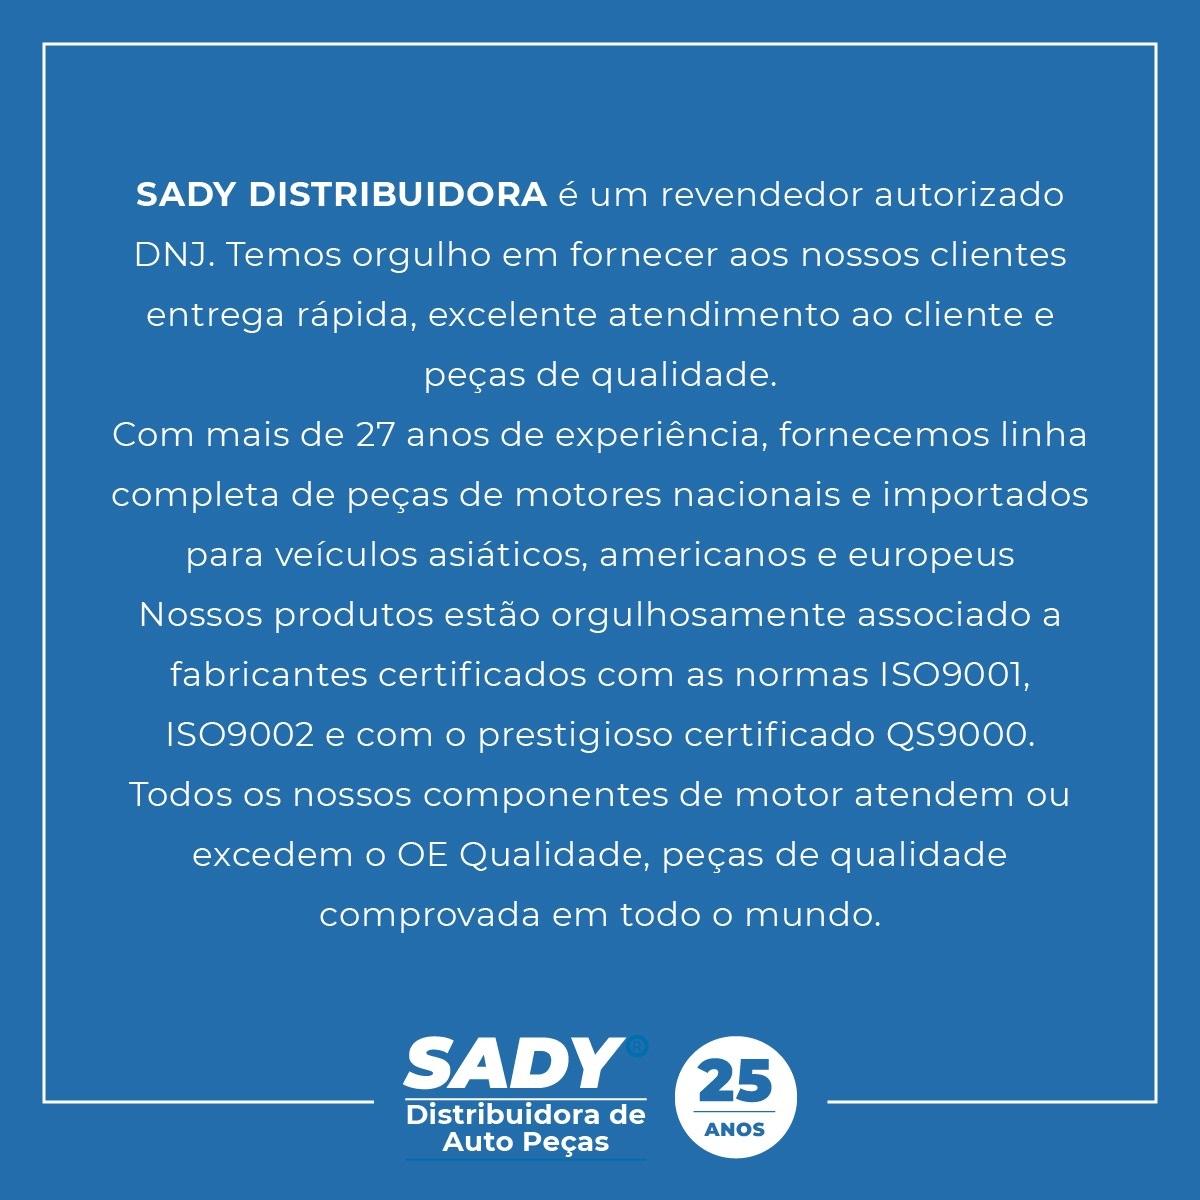 BOMBA DE OLEO DO MOTOR PORSCHE 2.5/3.4/3.6/3.8 24V